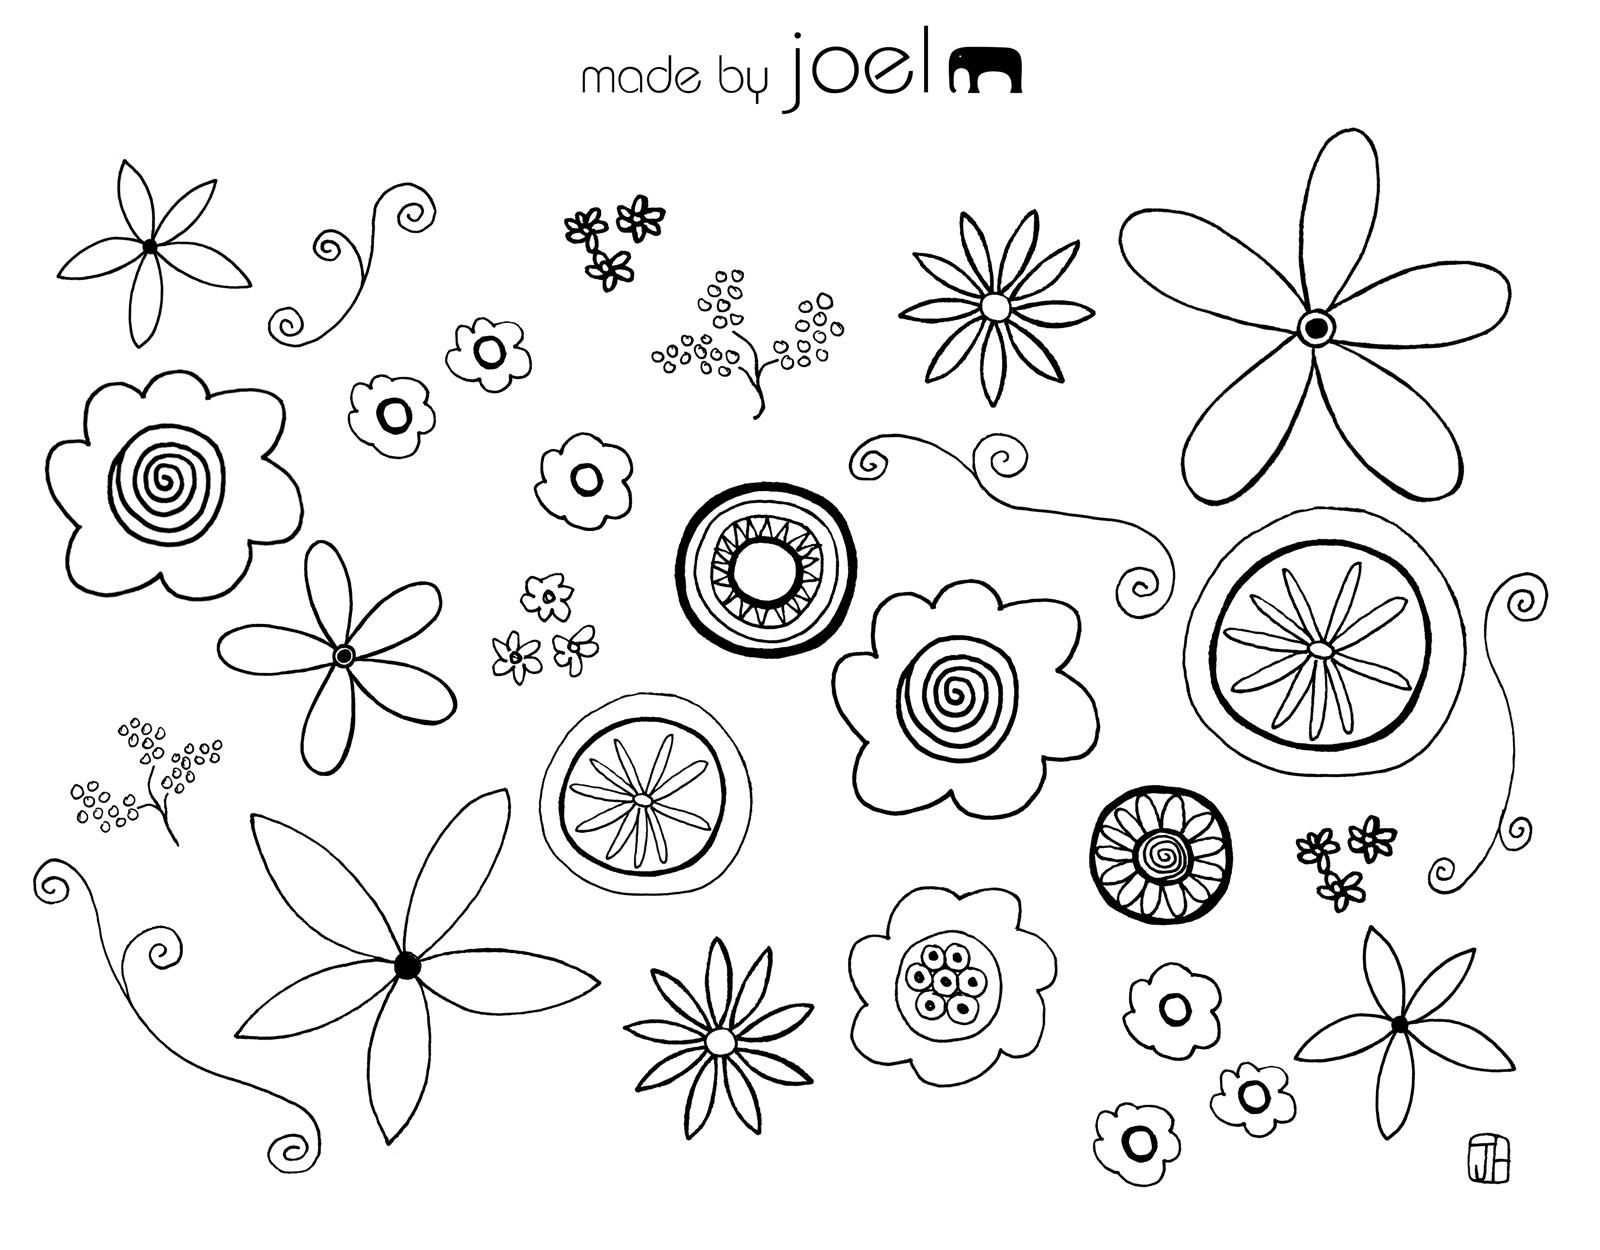 pin by diana leche on dibujitos pinterest doodles